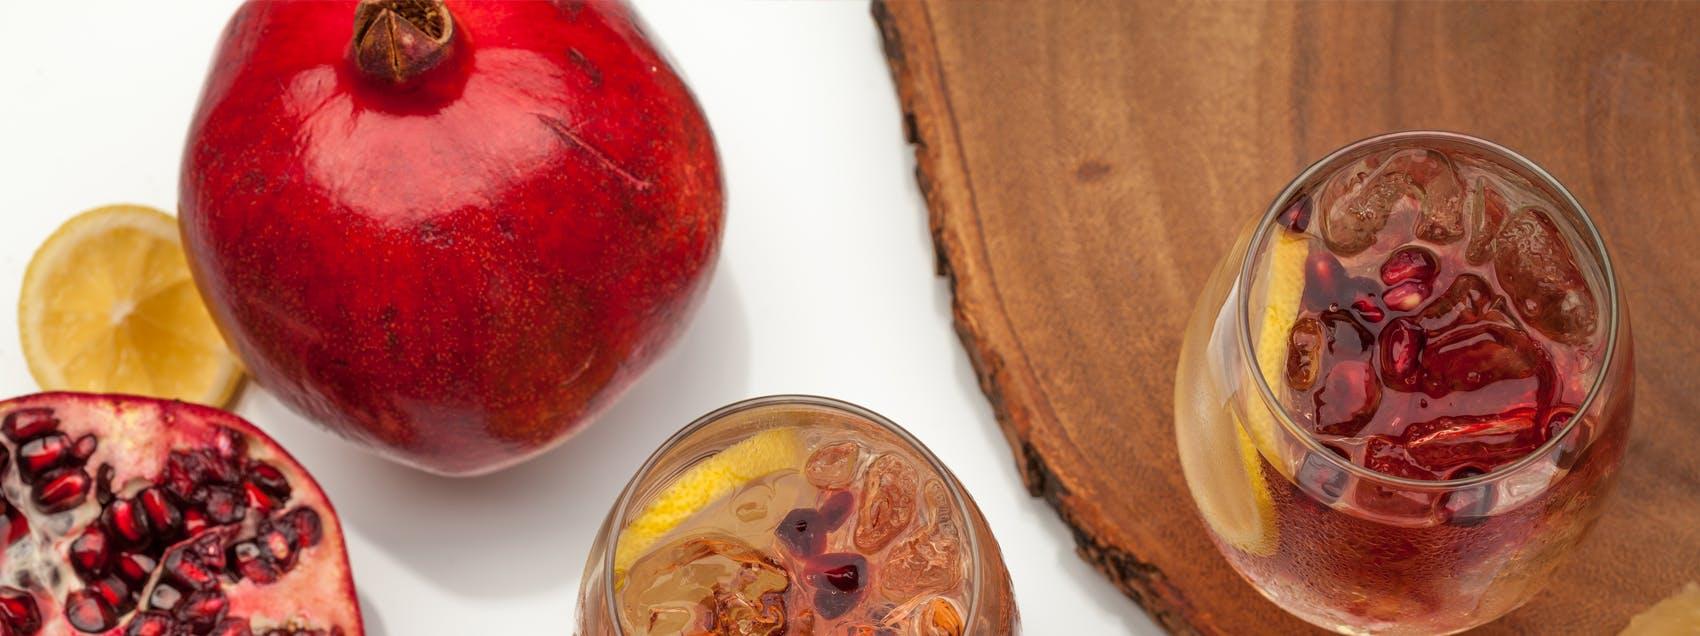 Pomegranate and Lemon White Wine Spritzer